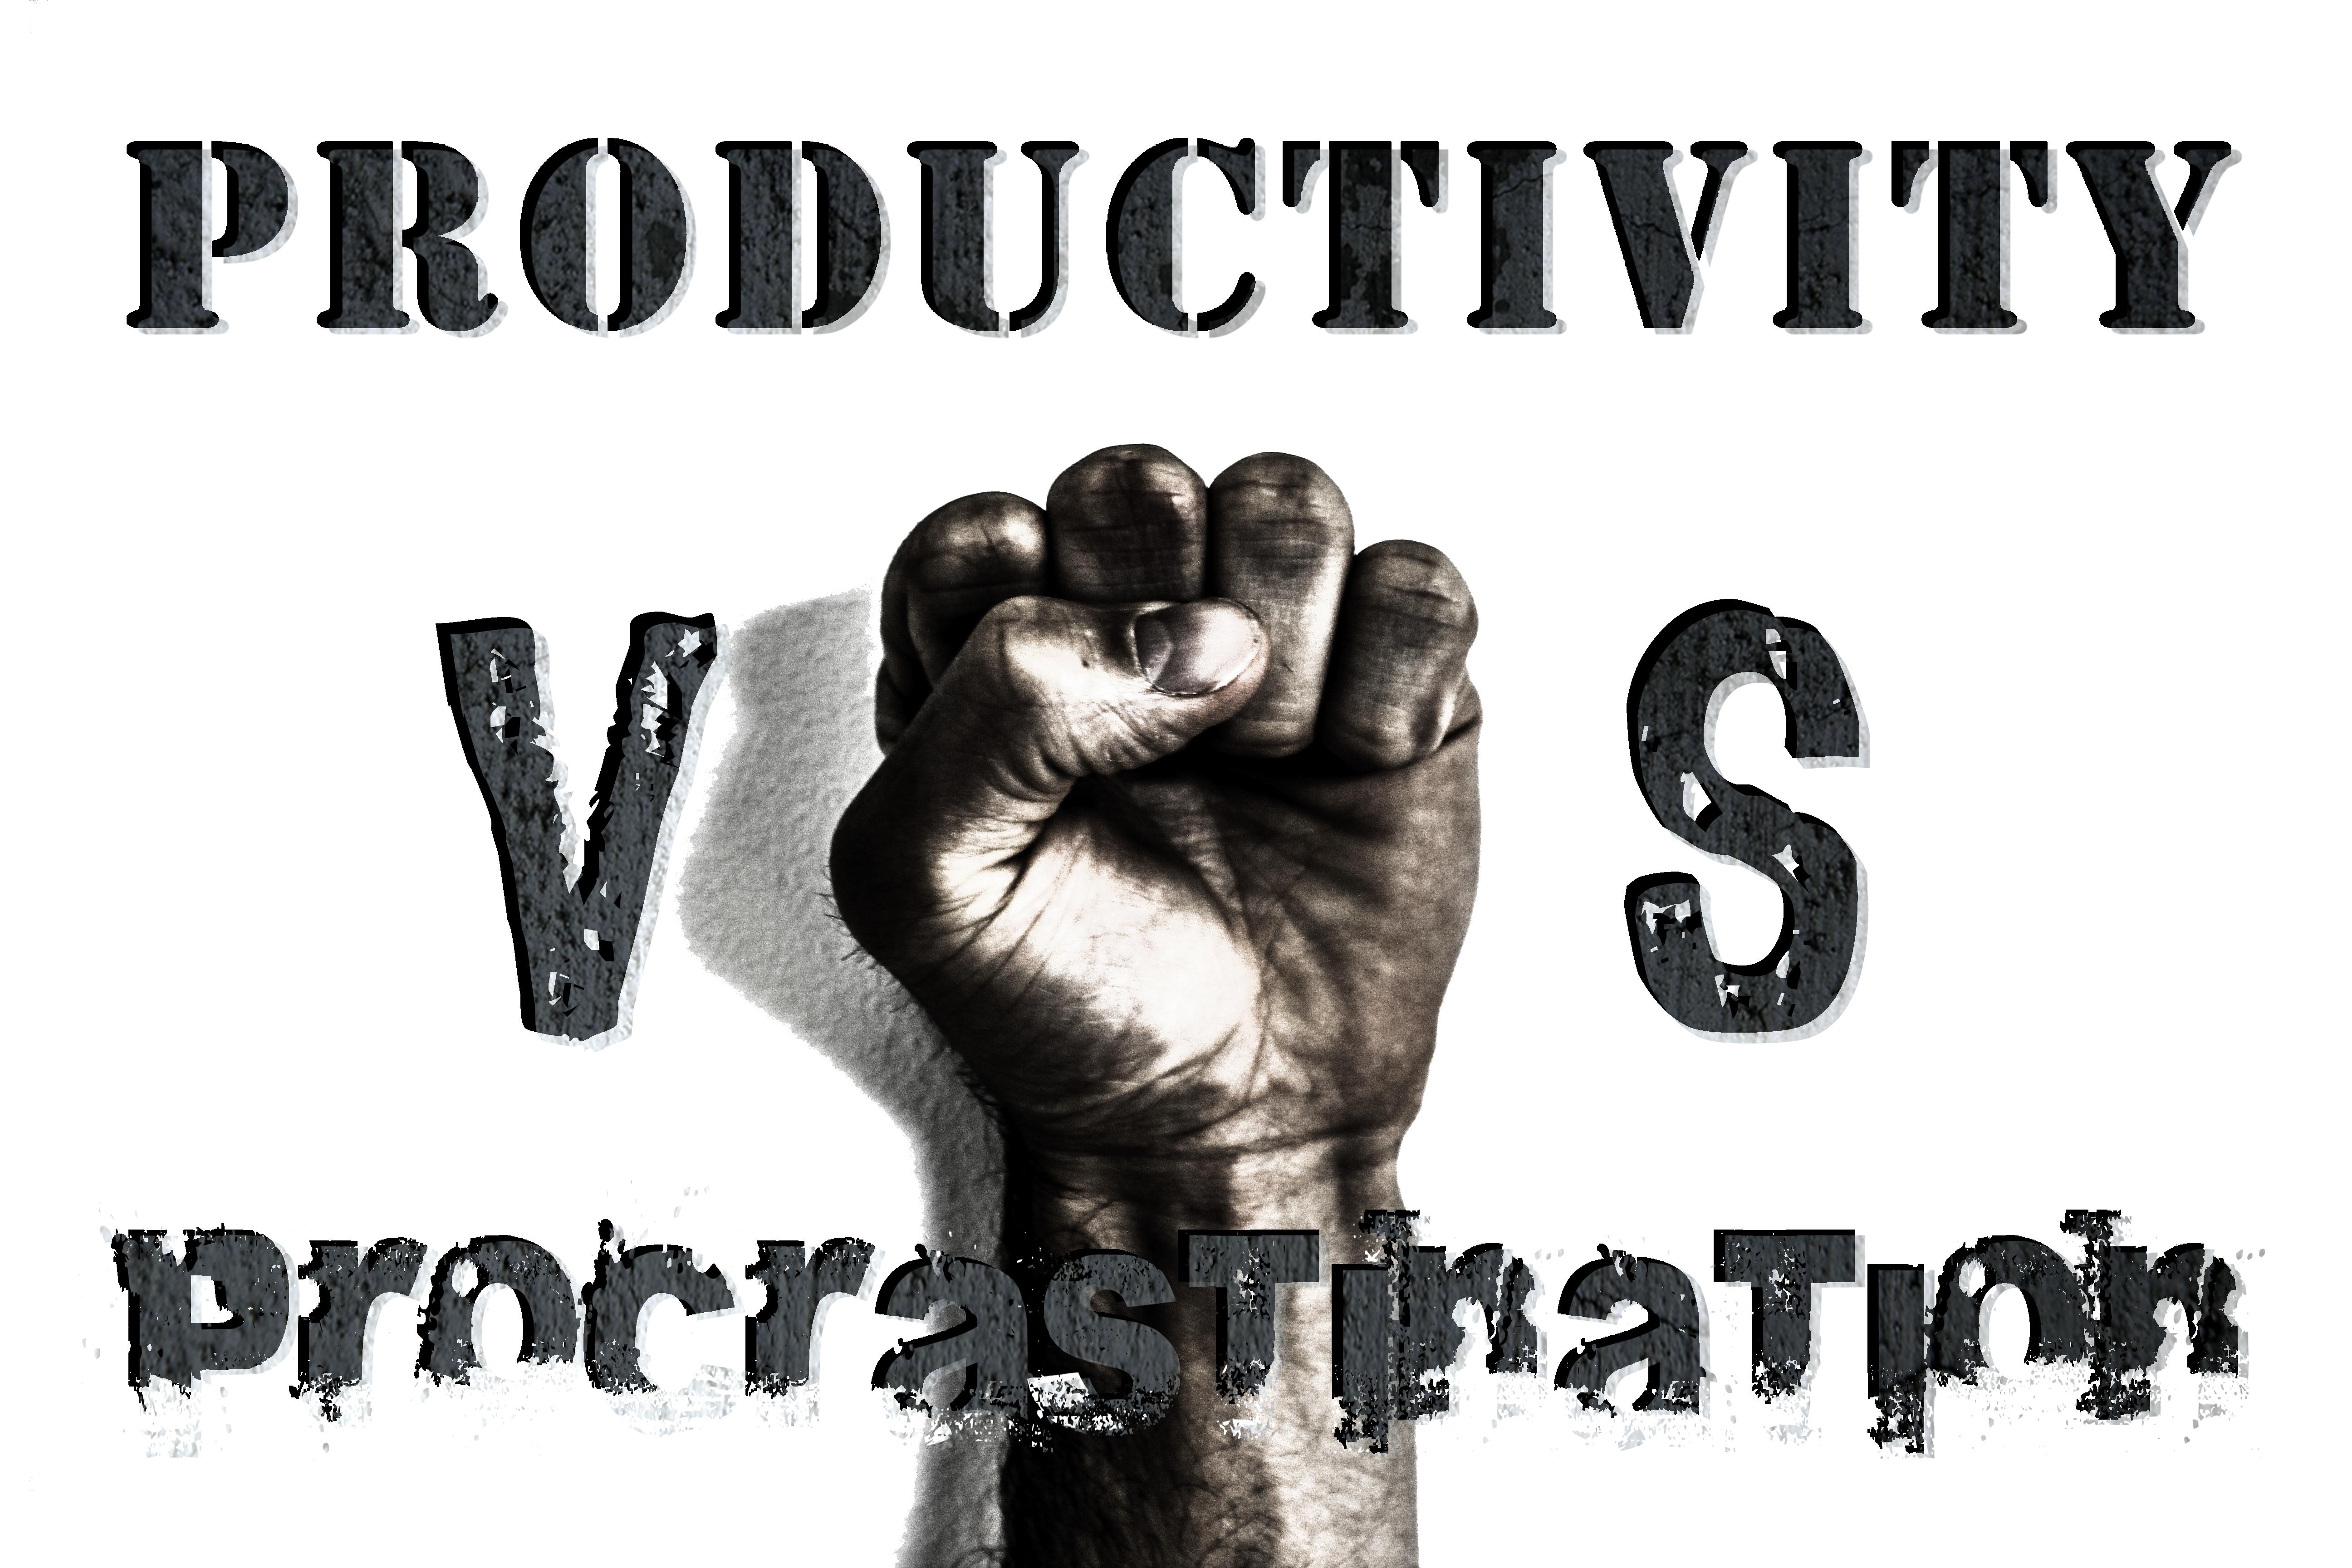 Productivity Vs Procrastination: 5 Pertinent Points